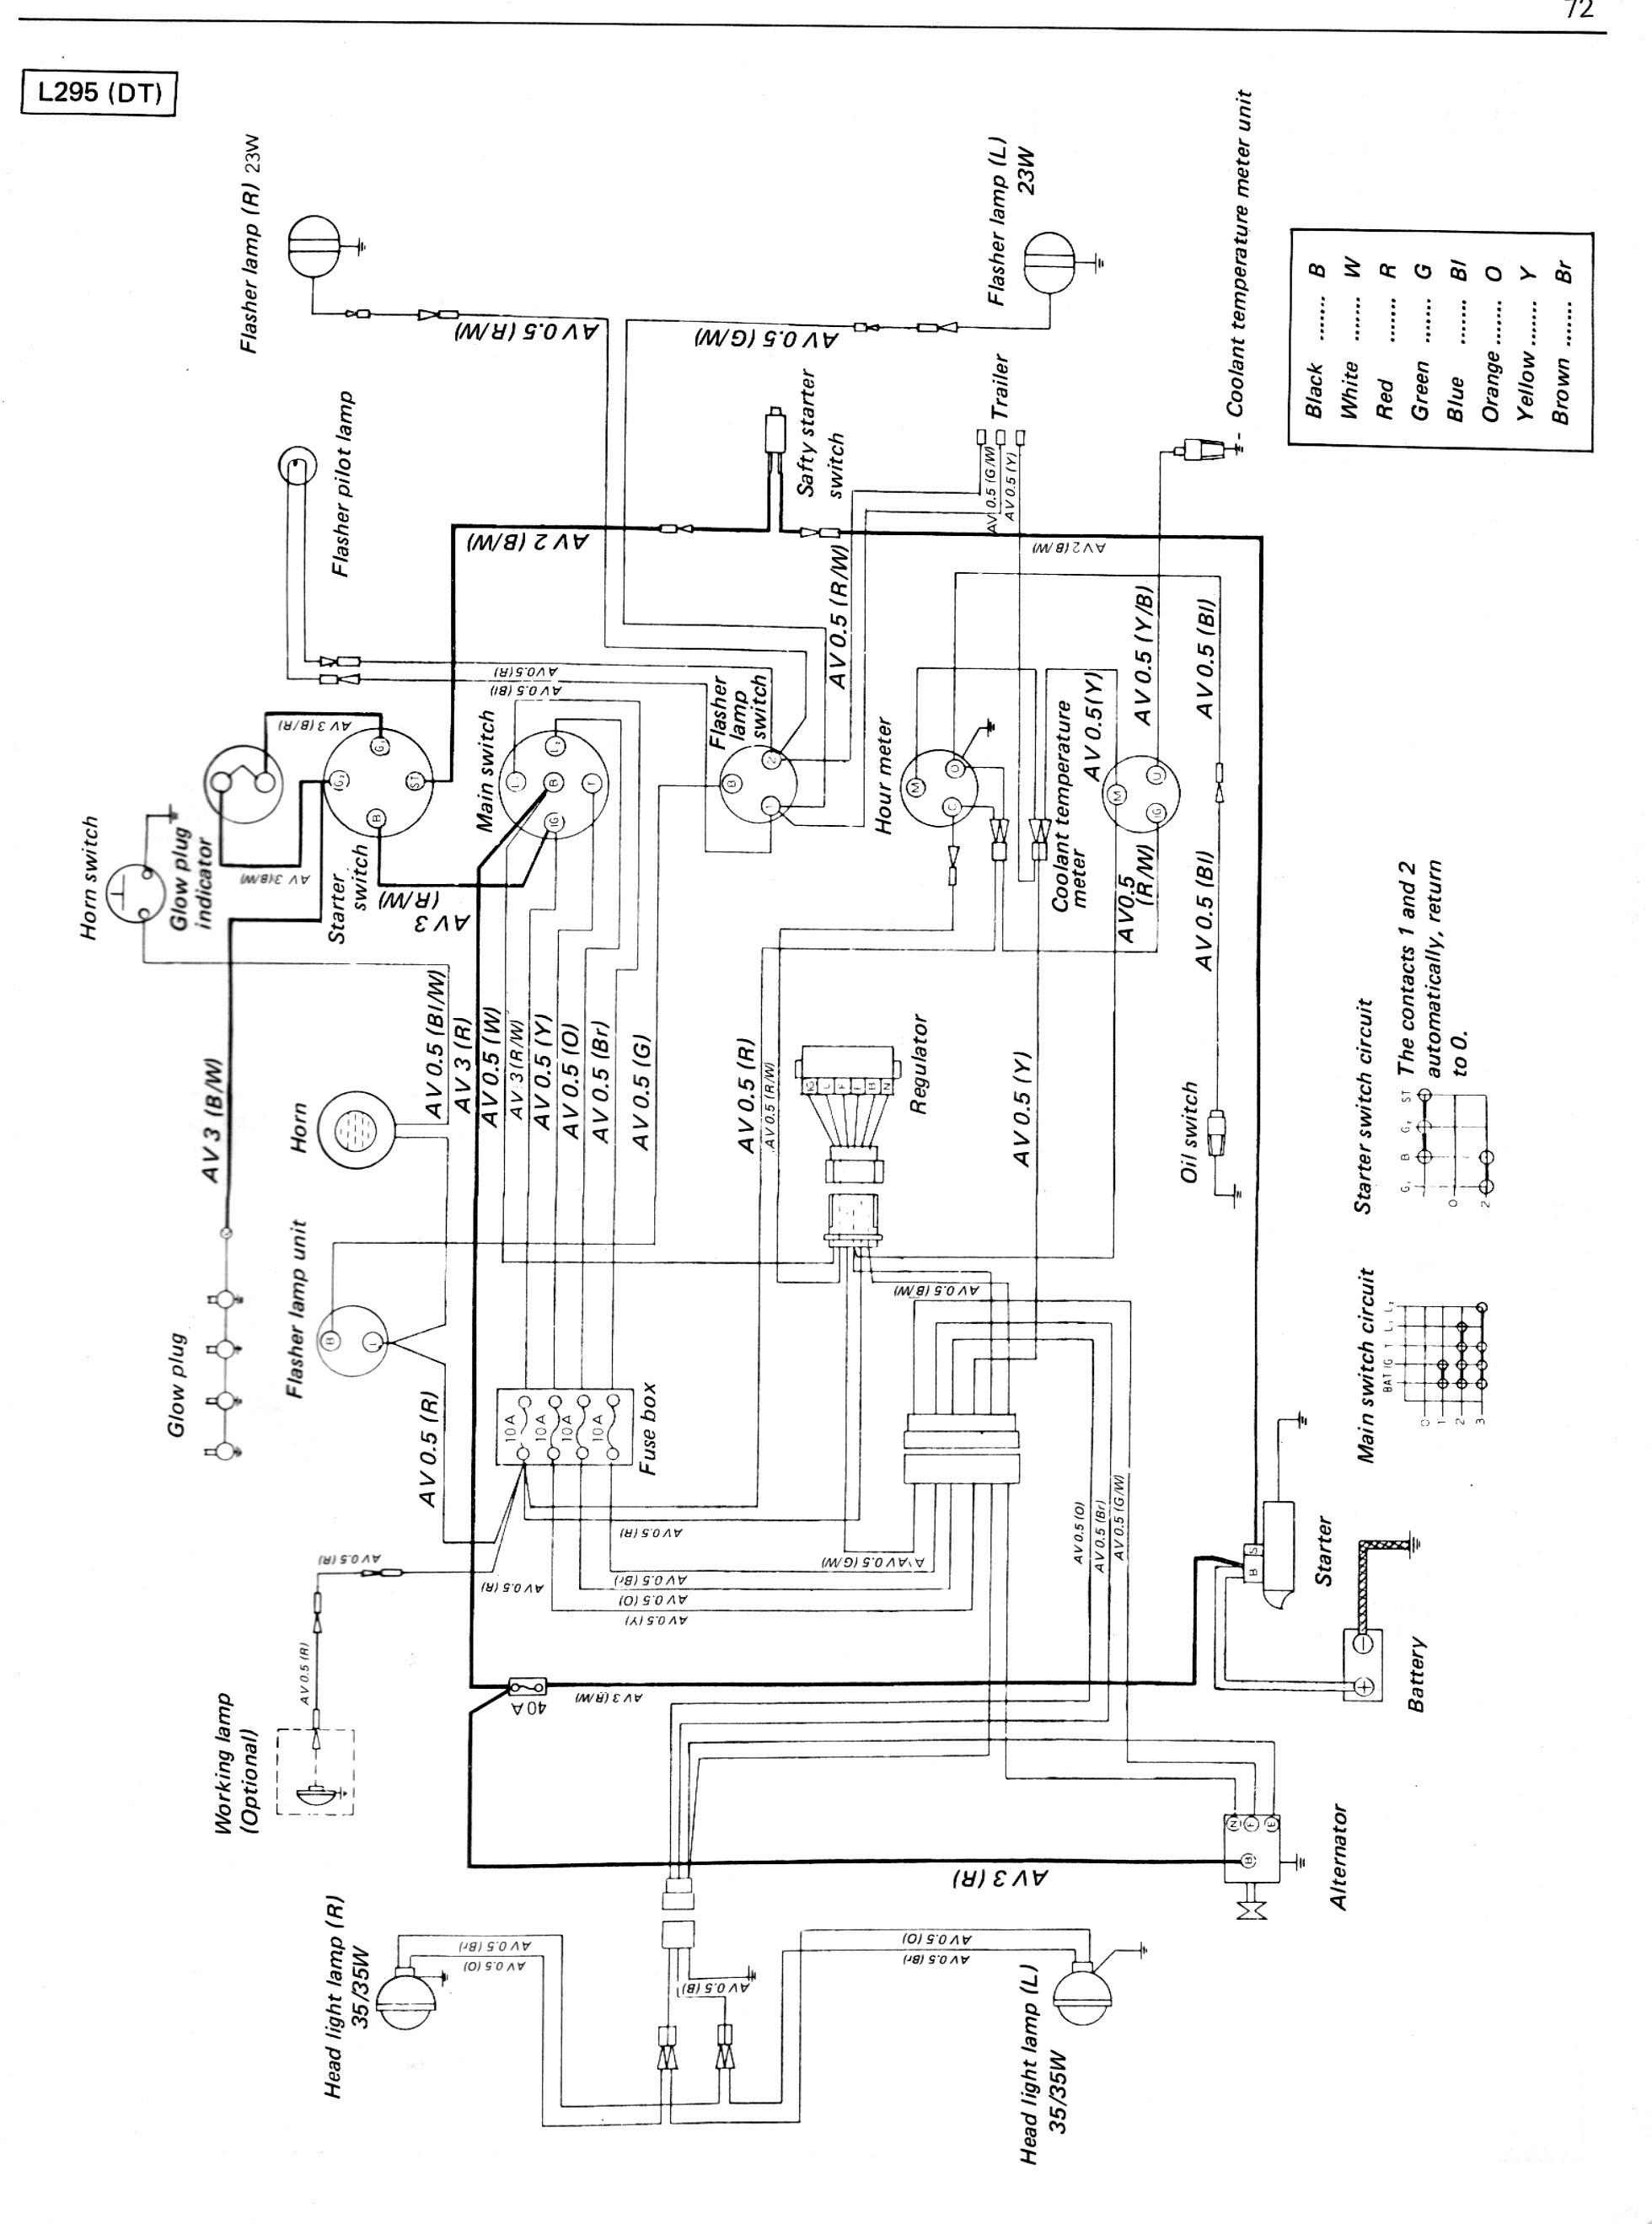 kioti engine diagram free image about wiring diagram wire center u2022 rh wattatech co